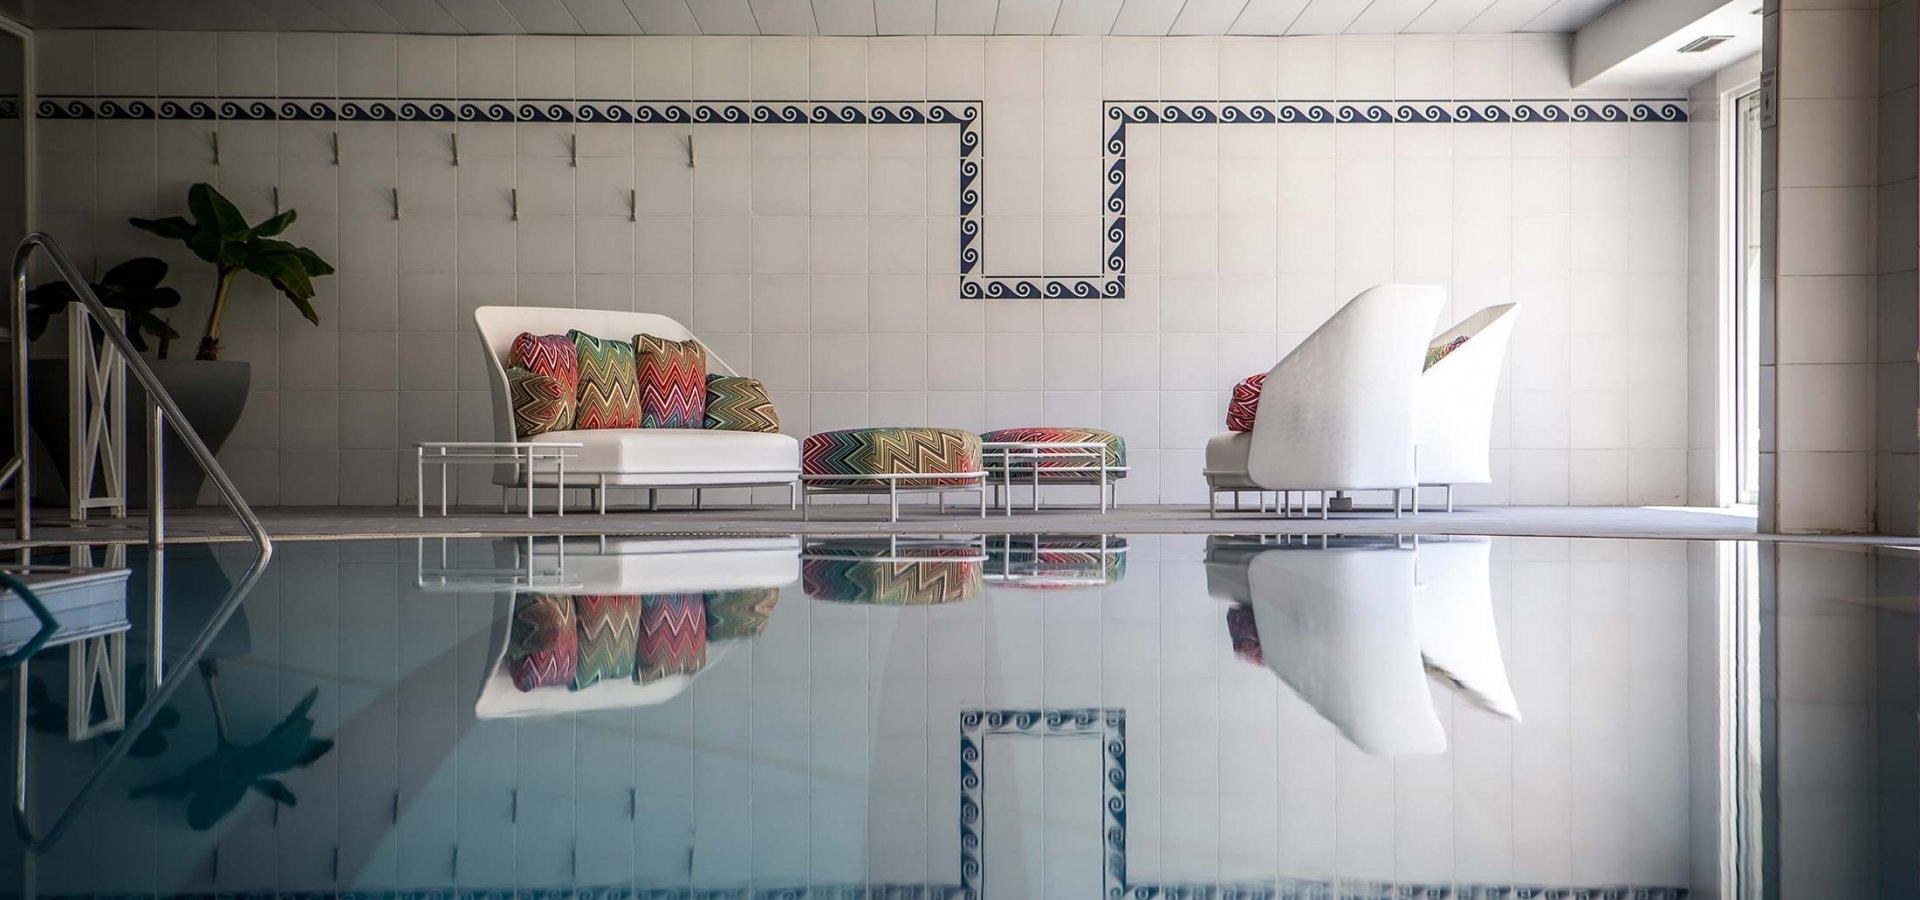 Hotels Vatel France #368